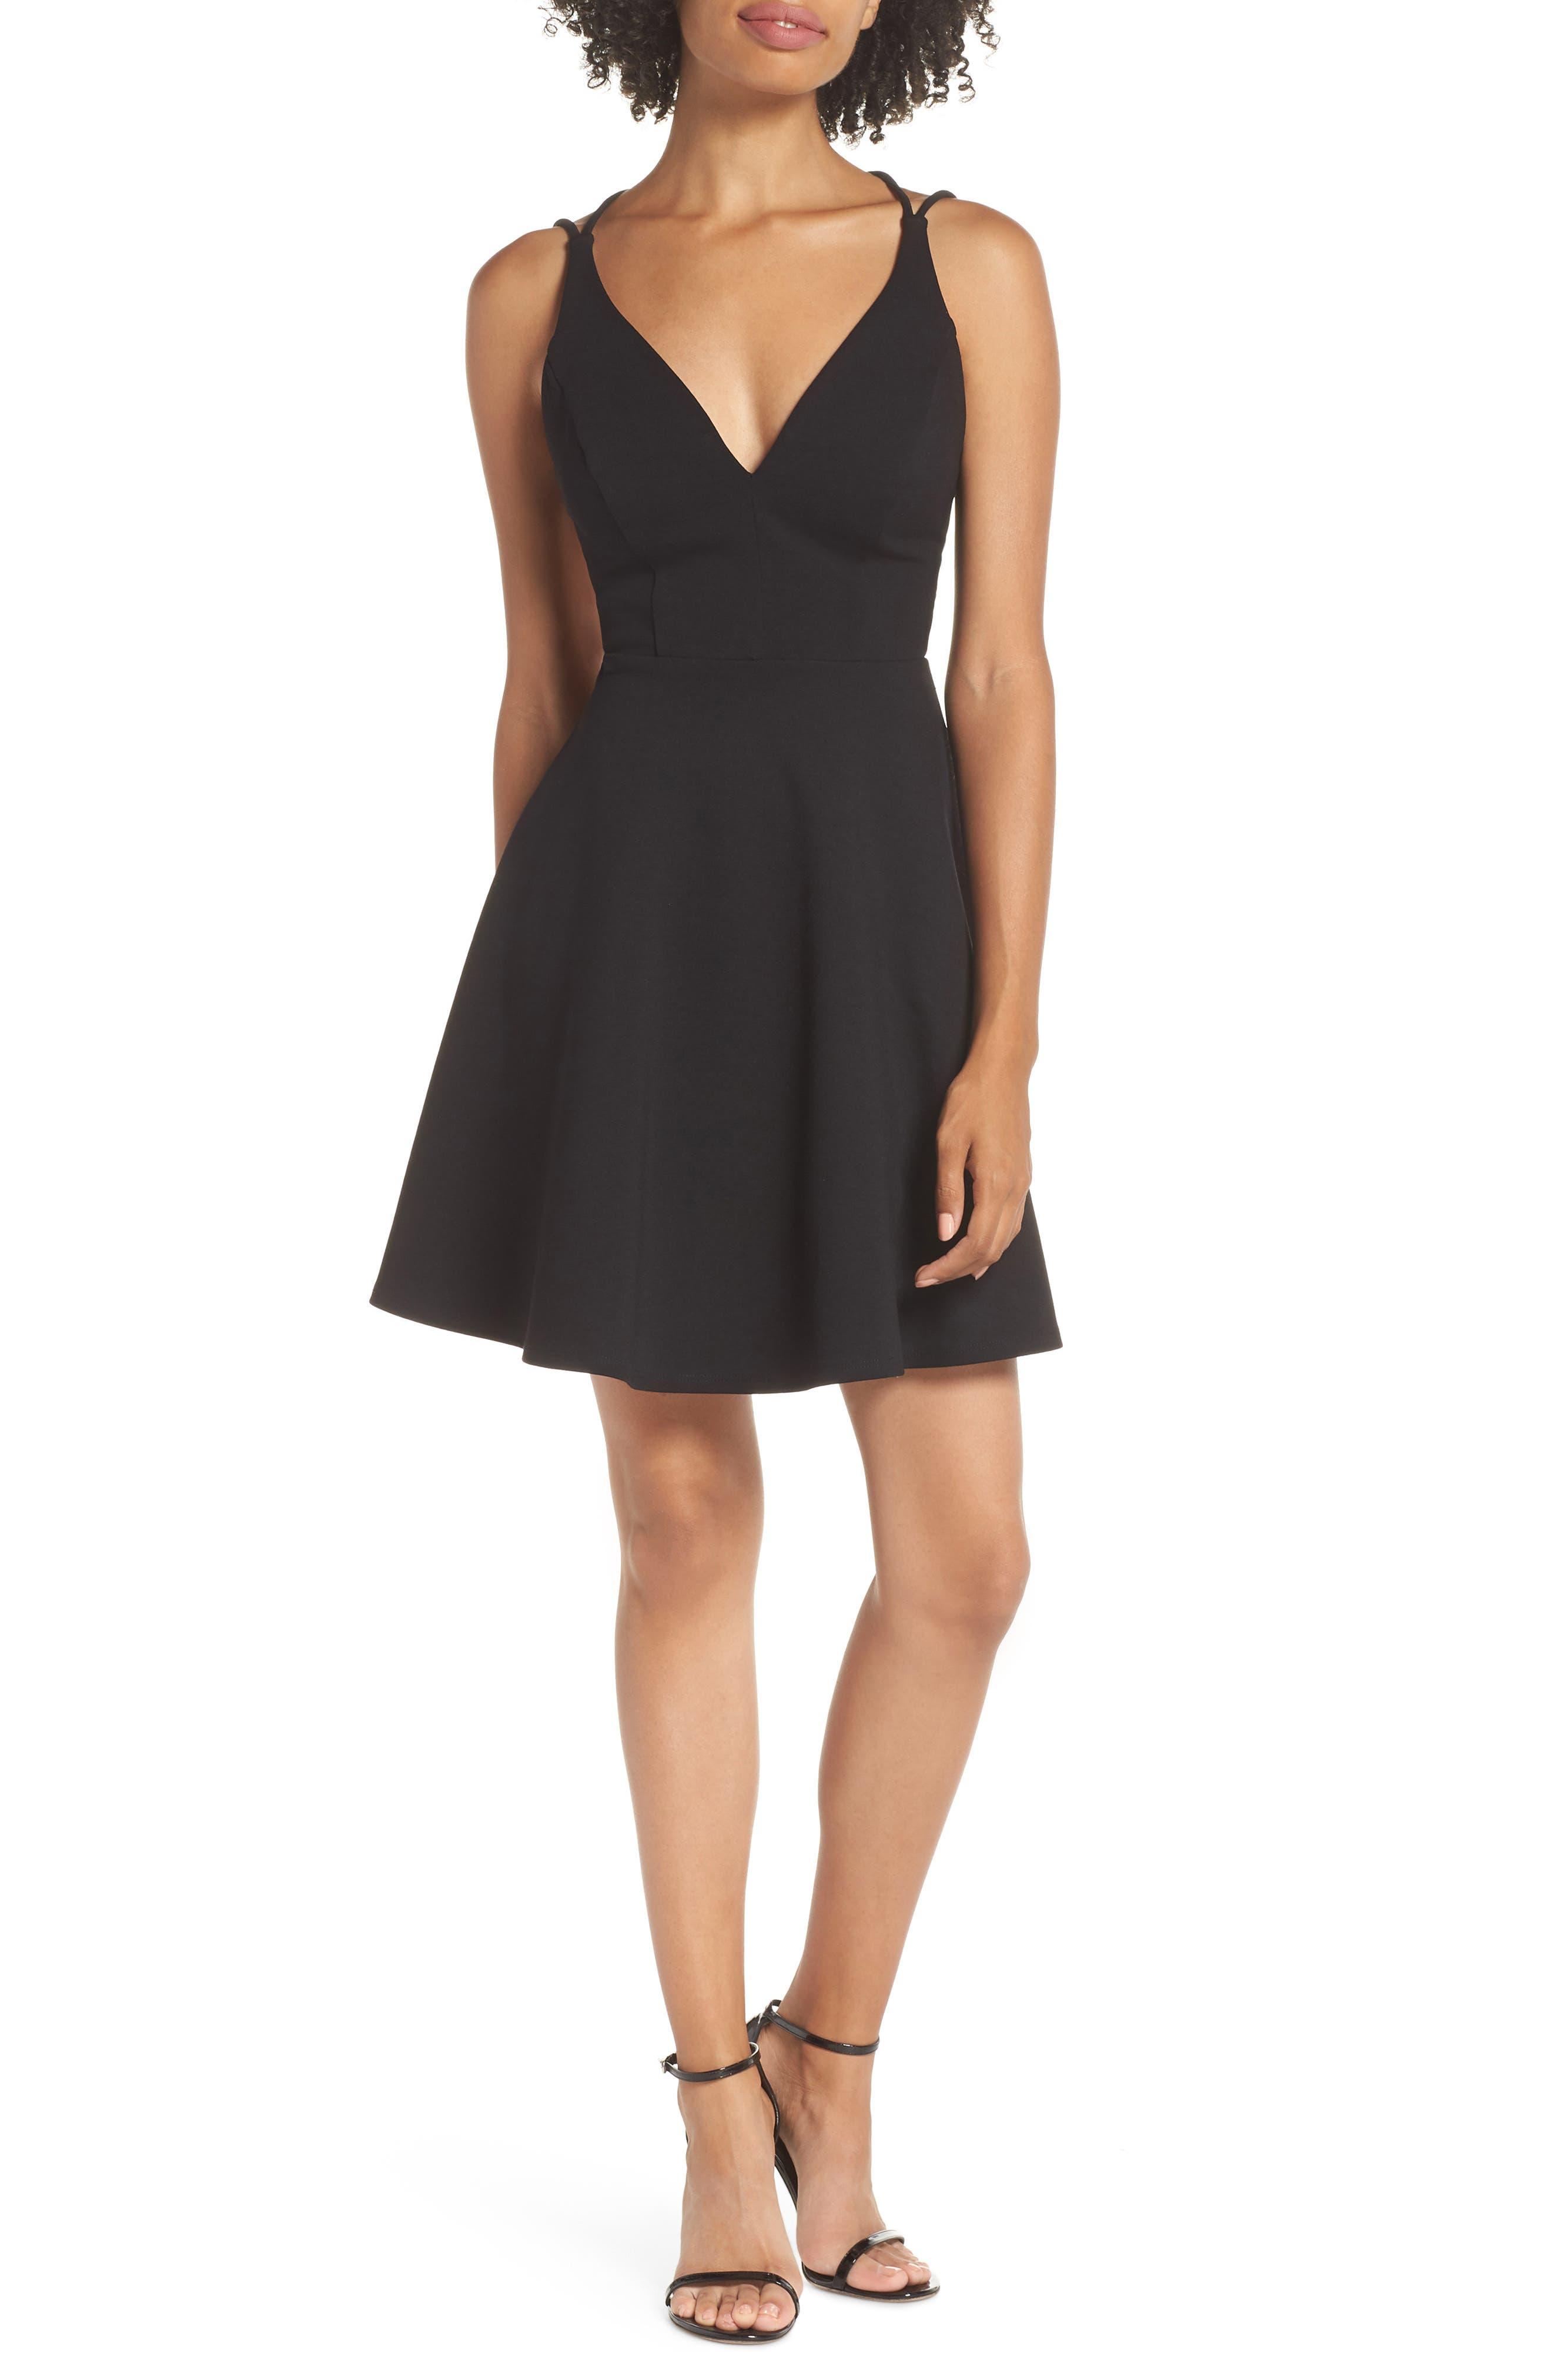 Lulus Believe In Love Strappy Back Skater Dress, Black